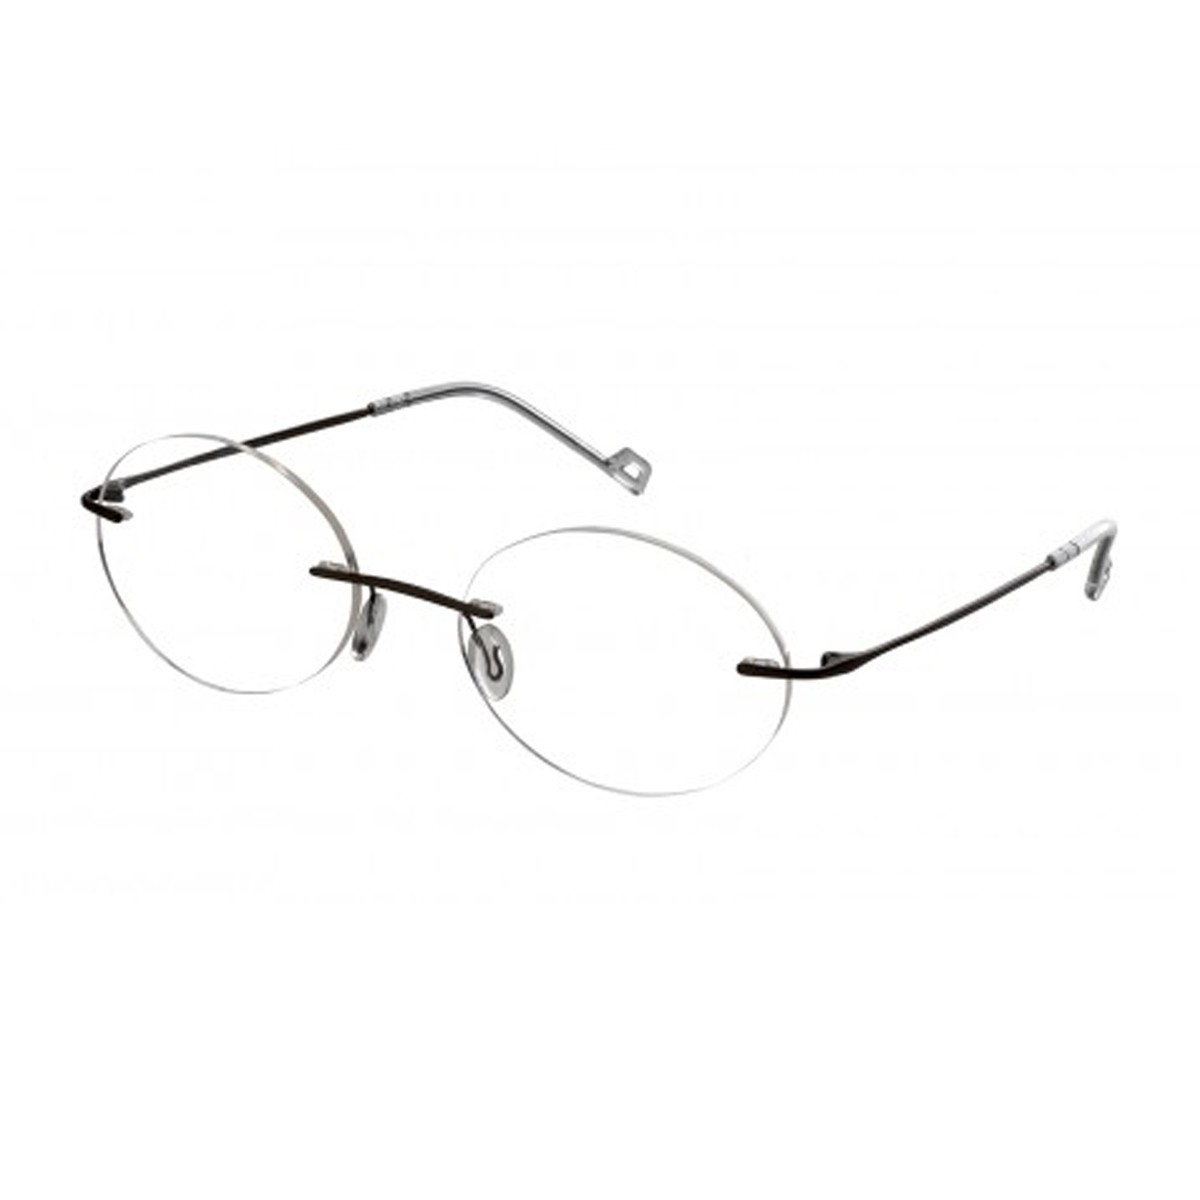 Try Titanium TY934 | Occhiali da vista Unisex